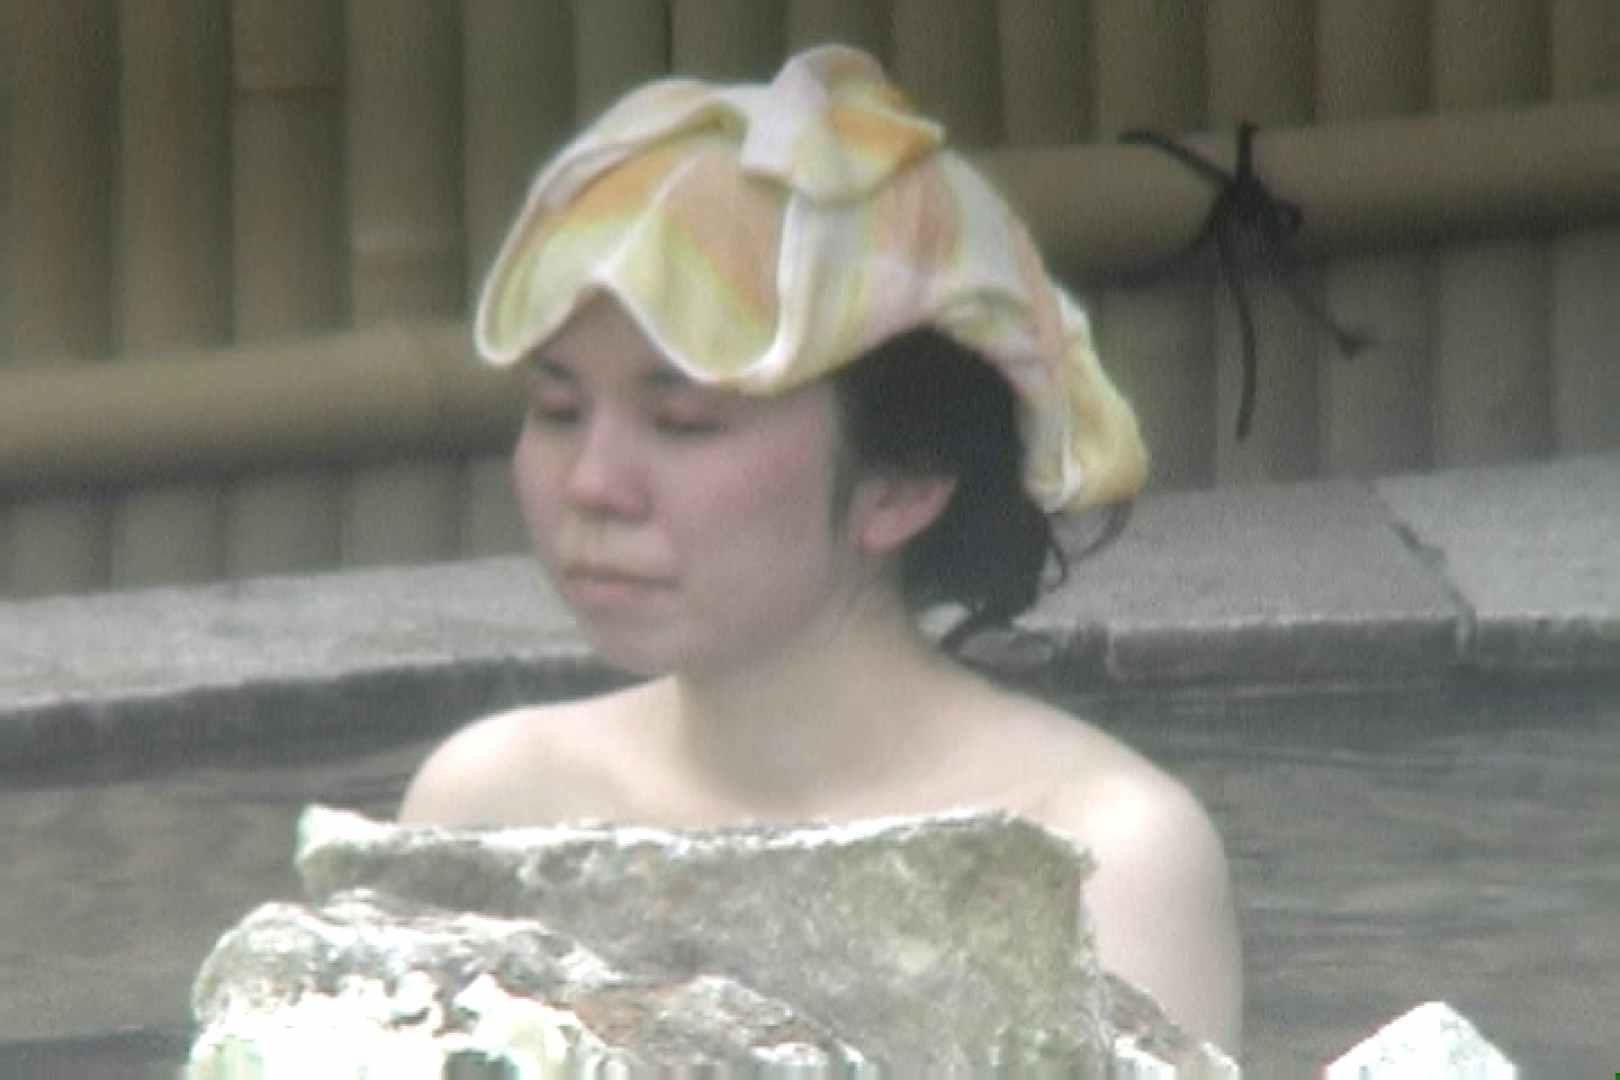 Aquaな露天風呂Vol.687 盗撮シリーズ | 露天風呂編  93PIX 47